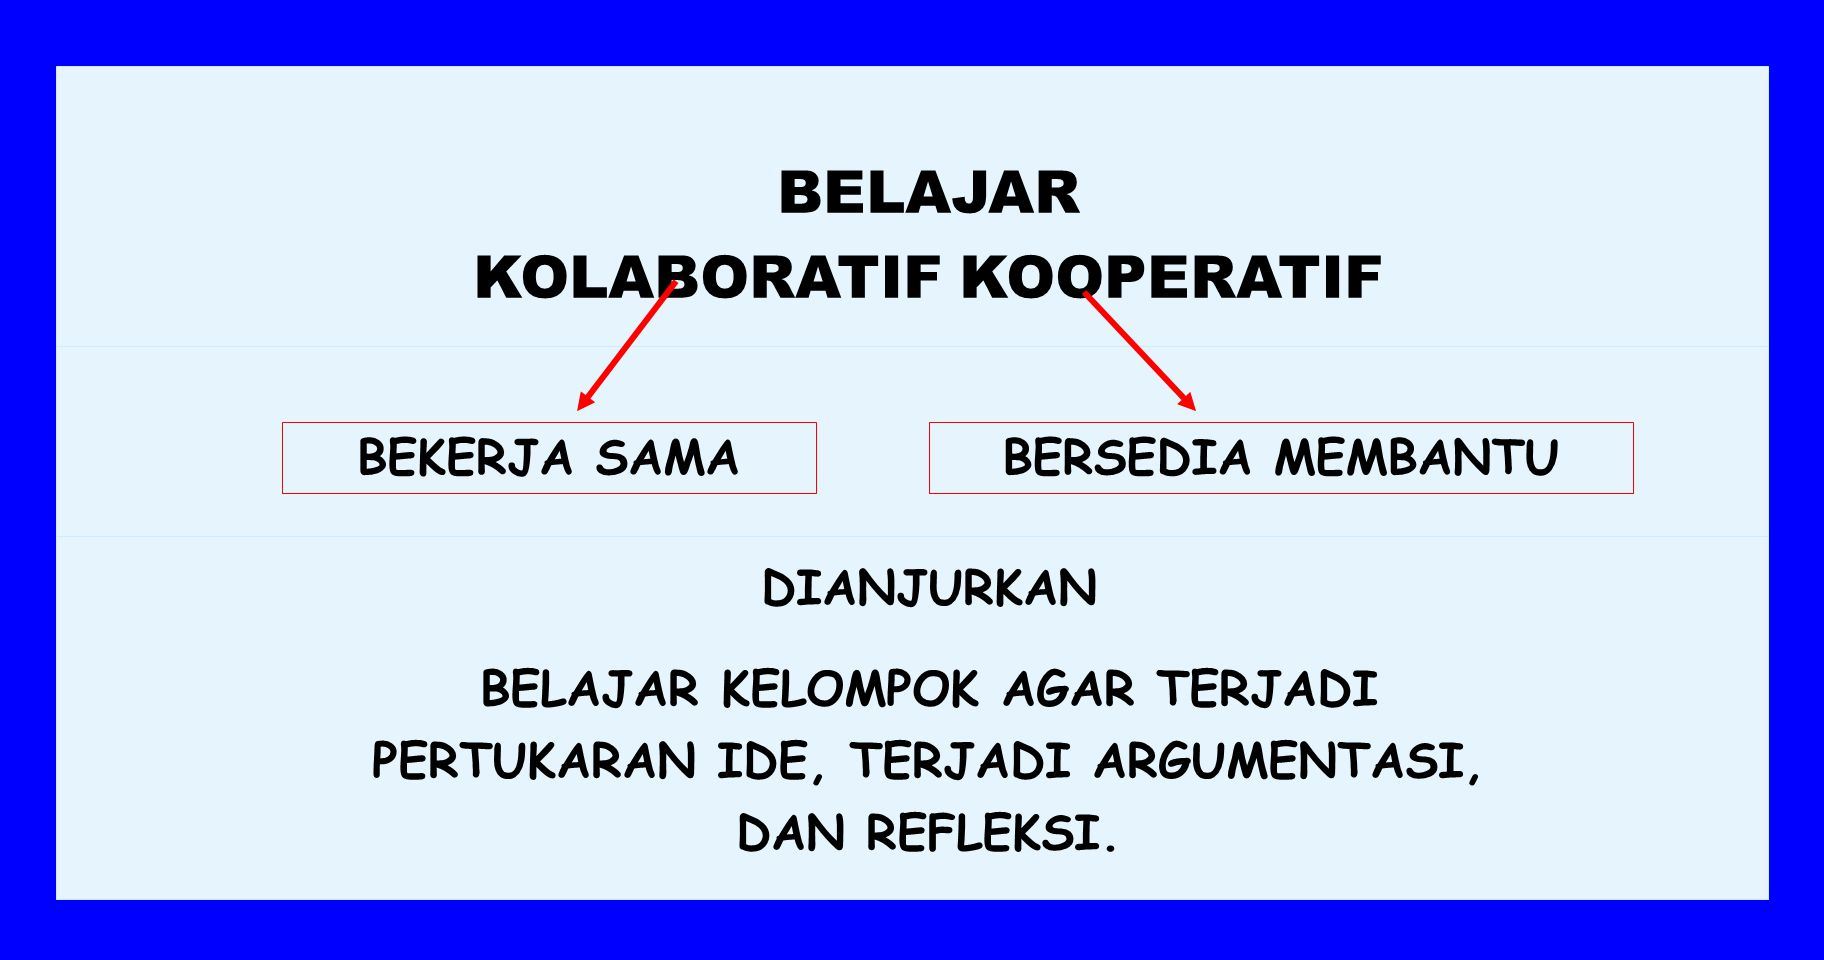 KOLABORATIF KOOPERATIF